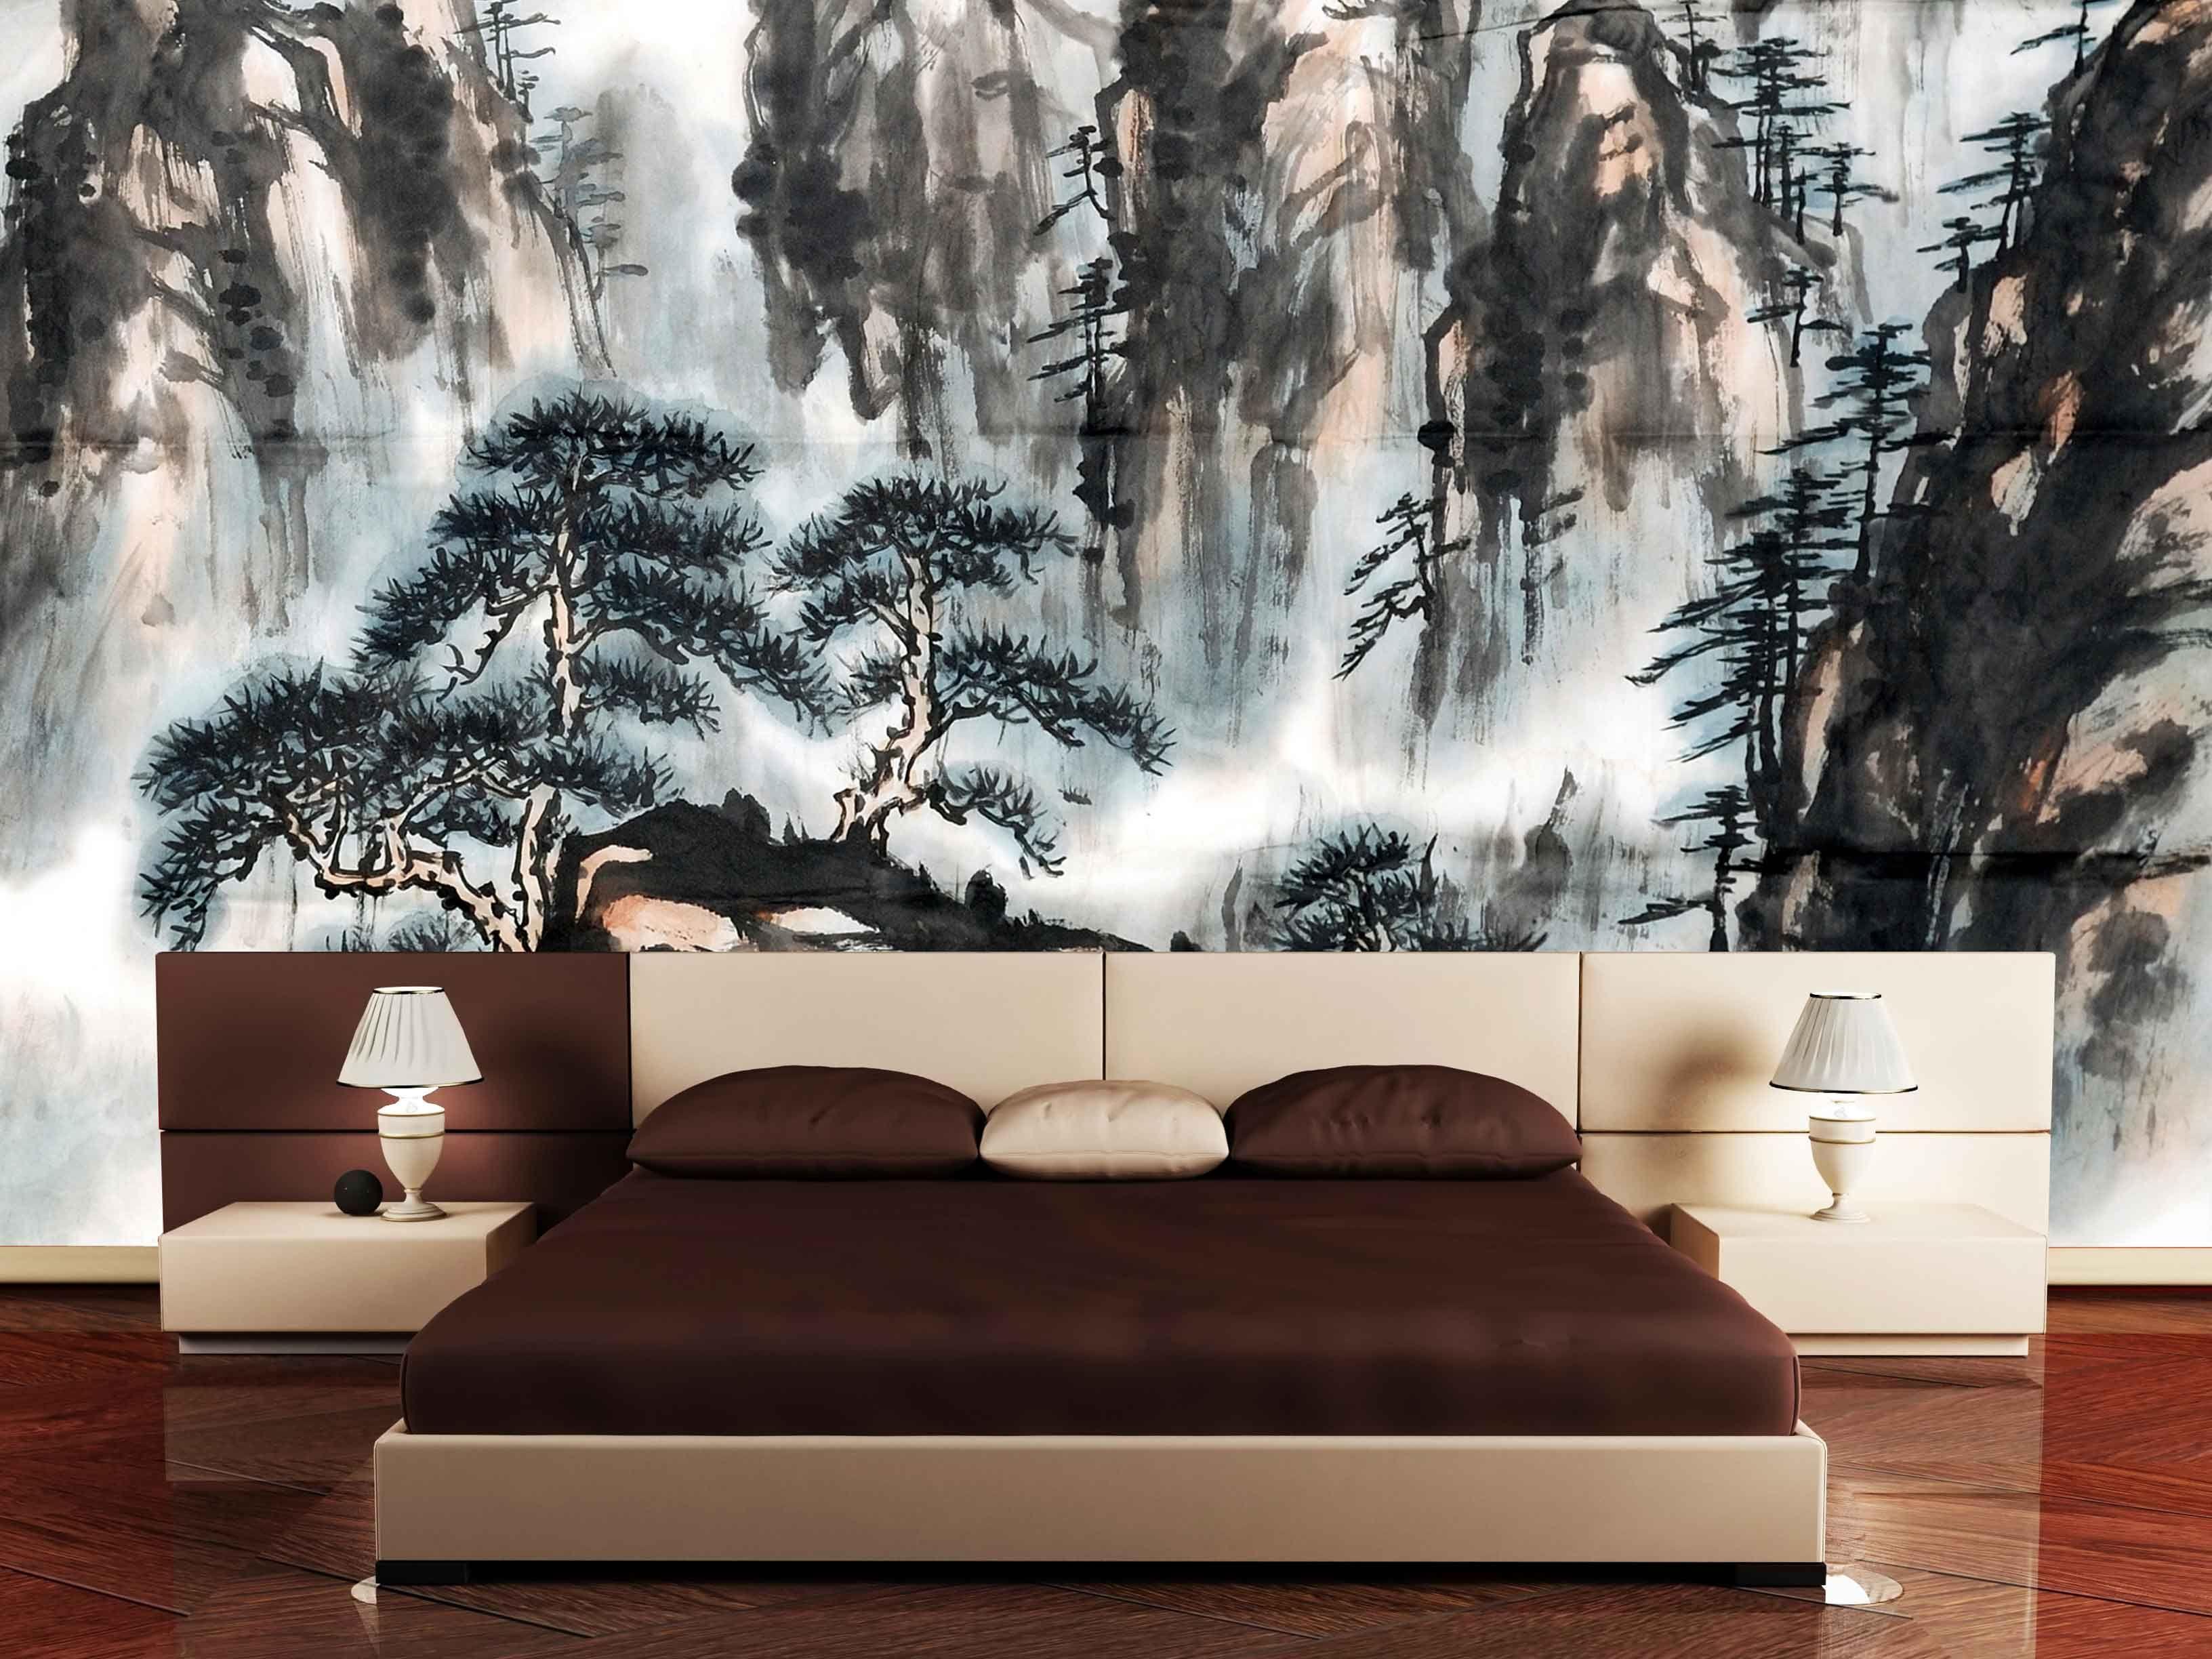 Japanese Design Bedroom. Great Looking Japanese Bedroom Design  Decorating Ideas